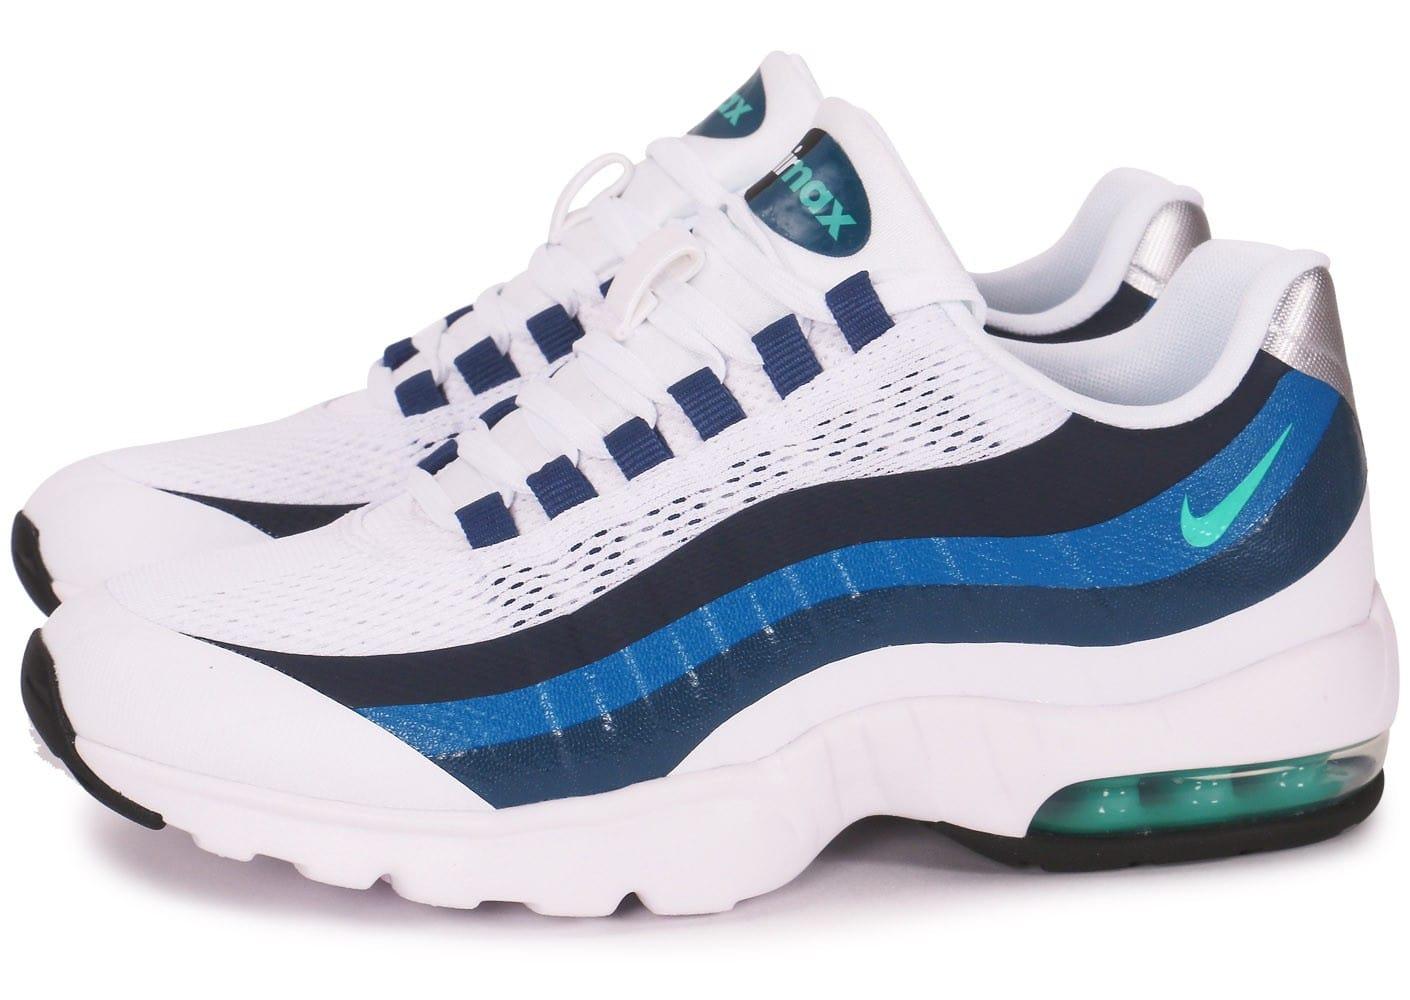 Nike Air Max 95 Essential 'Escadron Bleu' Sneakers Magasin Pas Cher Homme   Femme